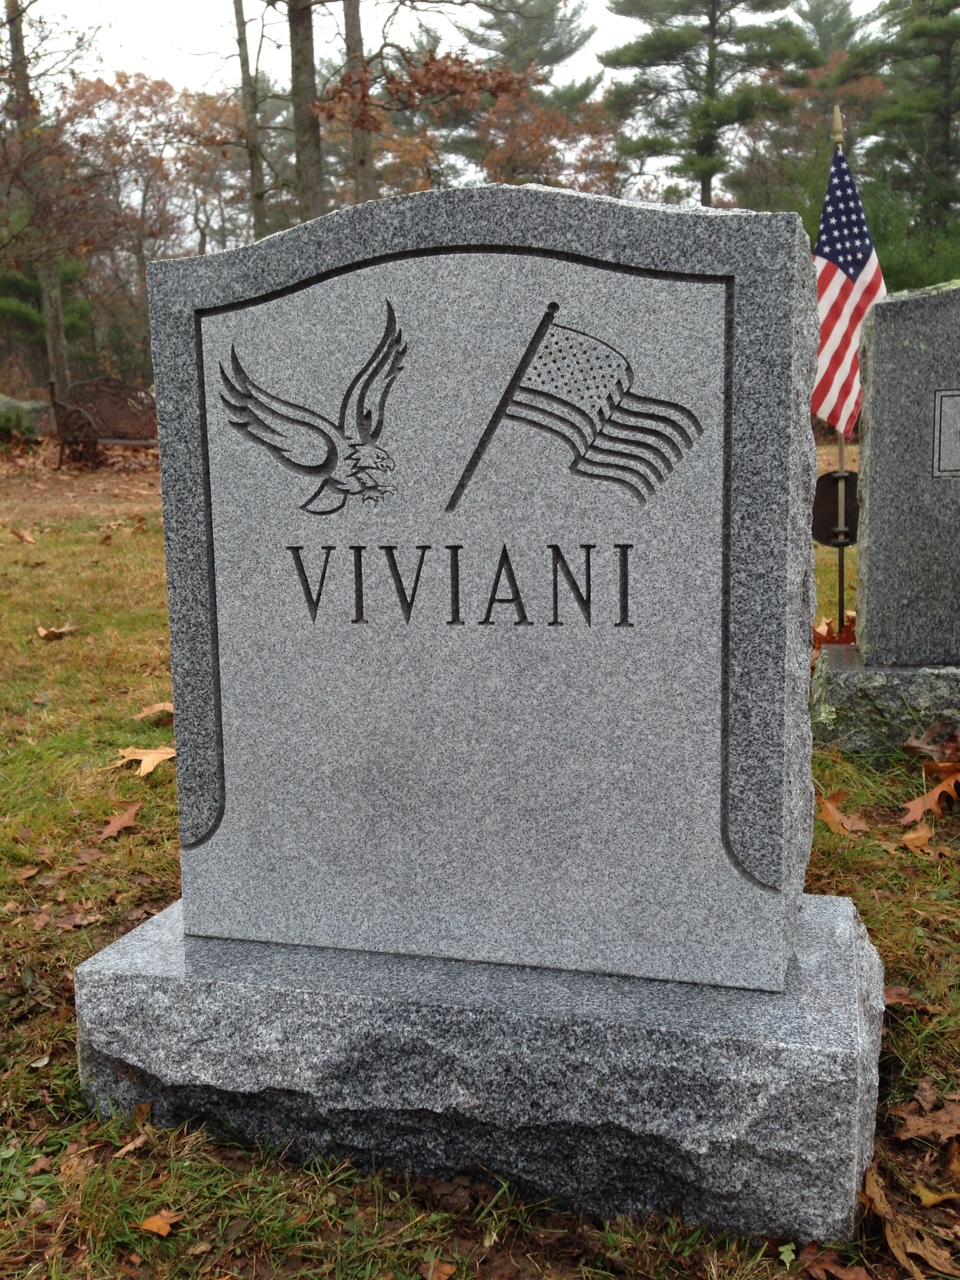 VIVIANI front.JPG